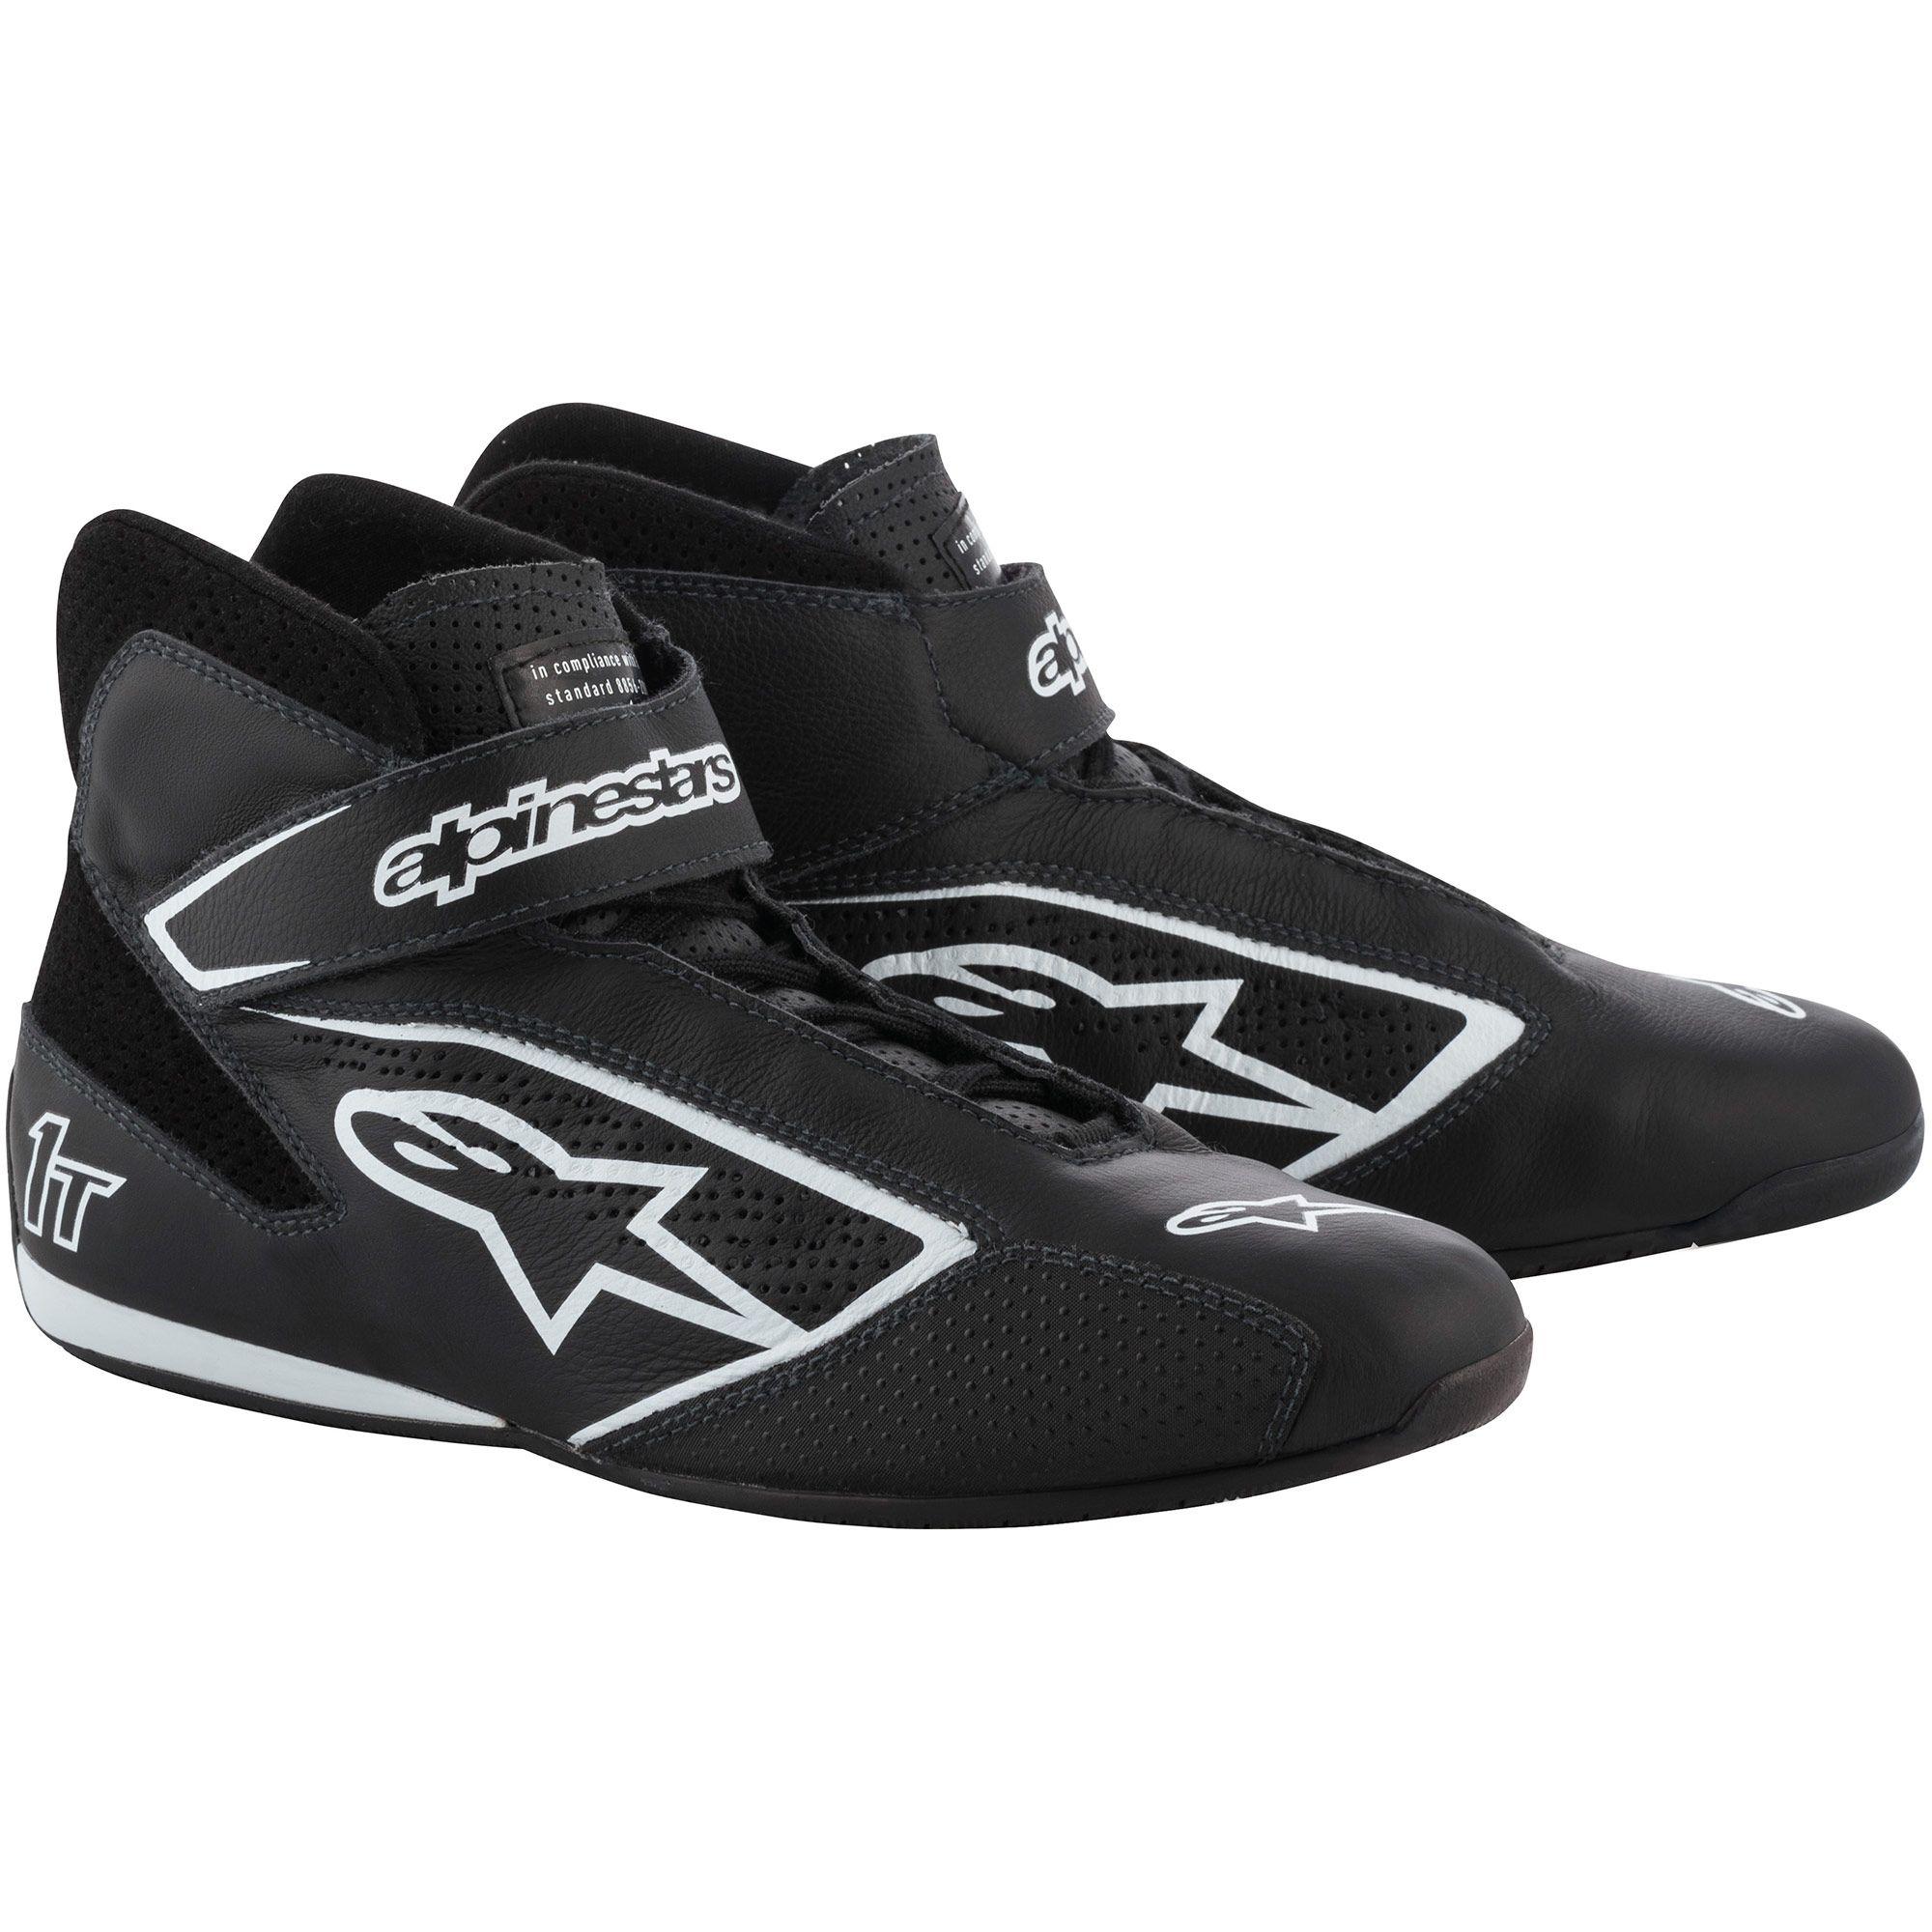 Alpinestars Tech 1-T Race Shoes black/white